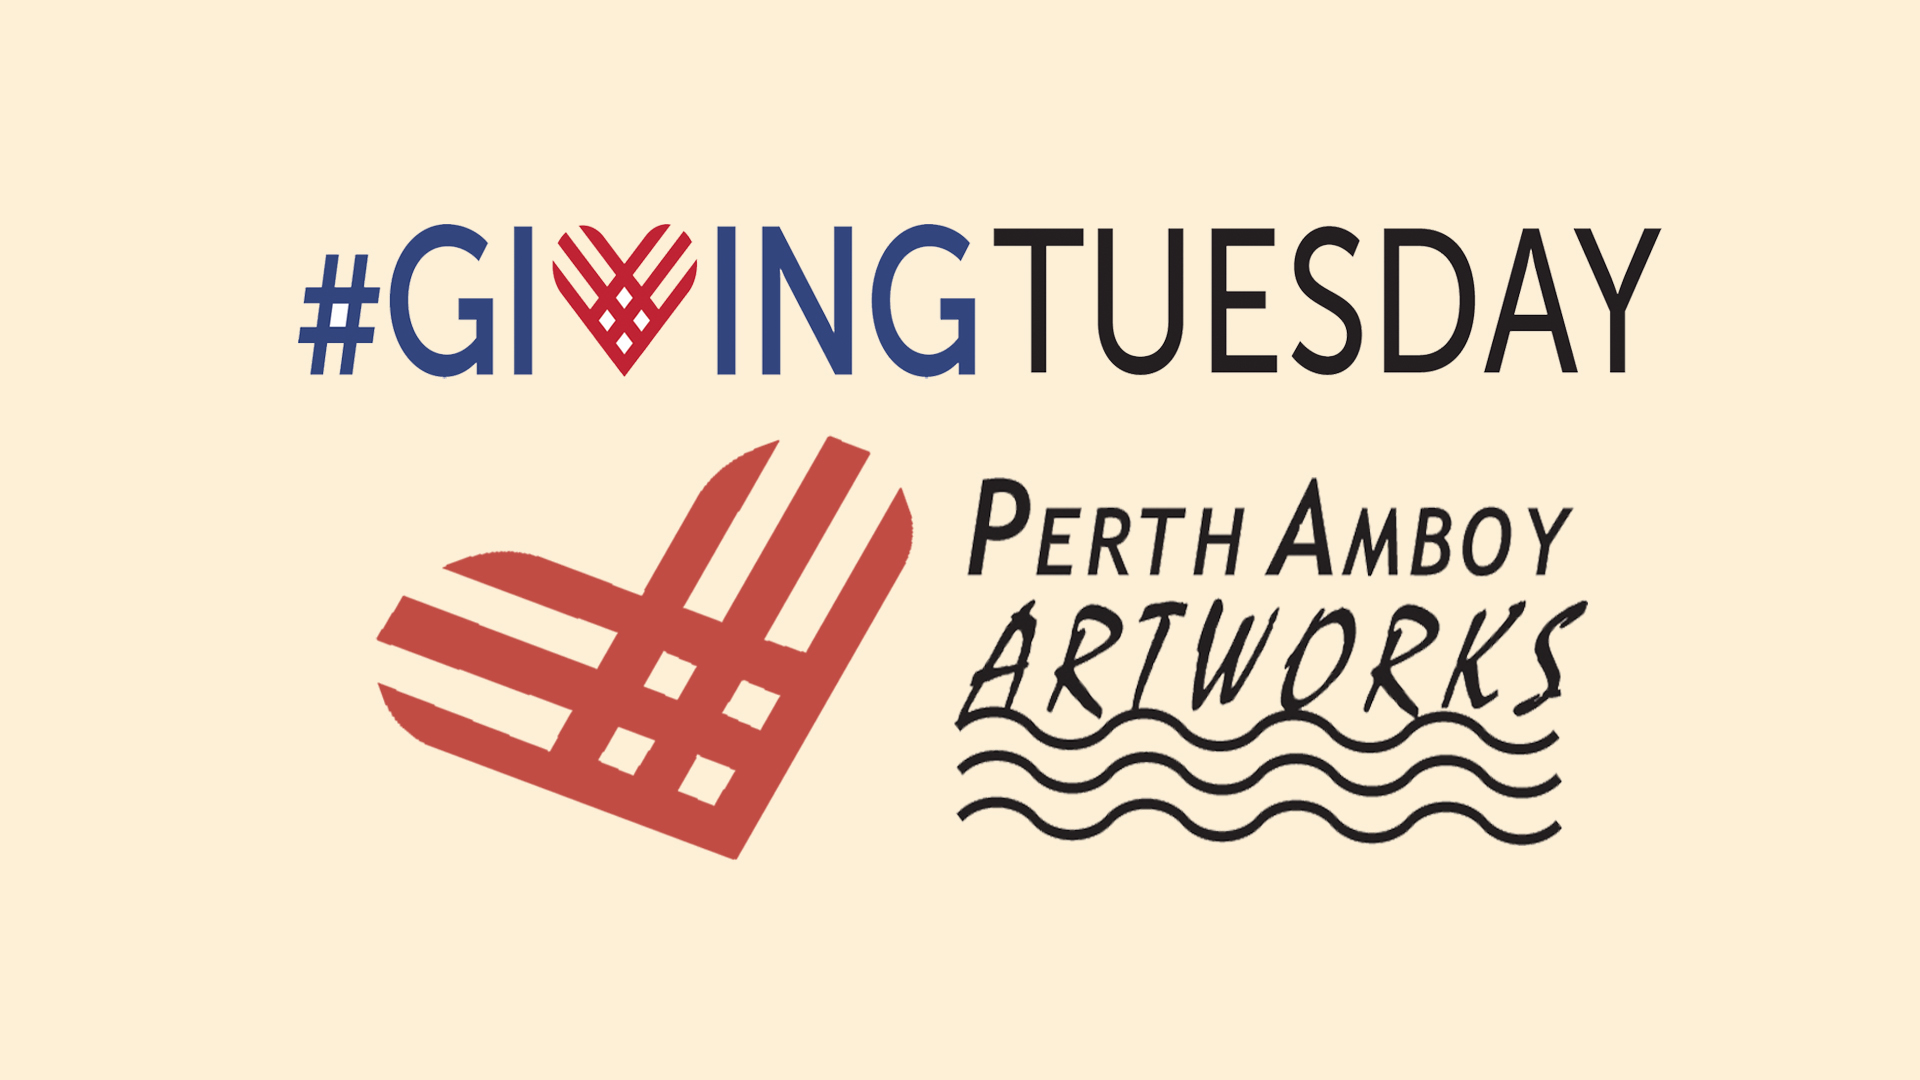 Giving Tuesday 2018 Perth Amboy Artworks